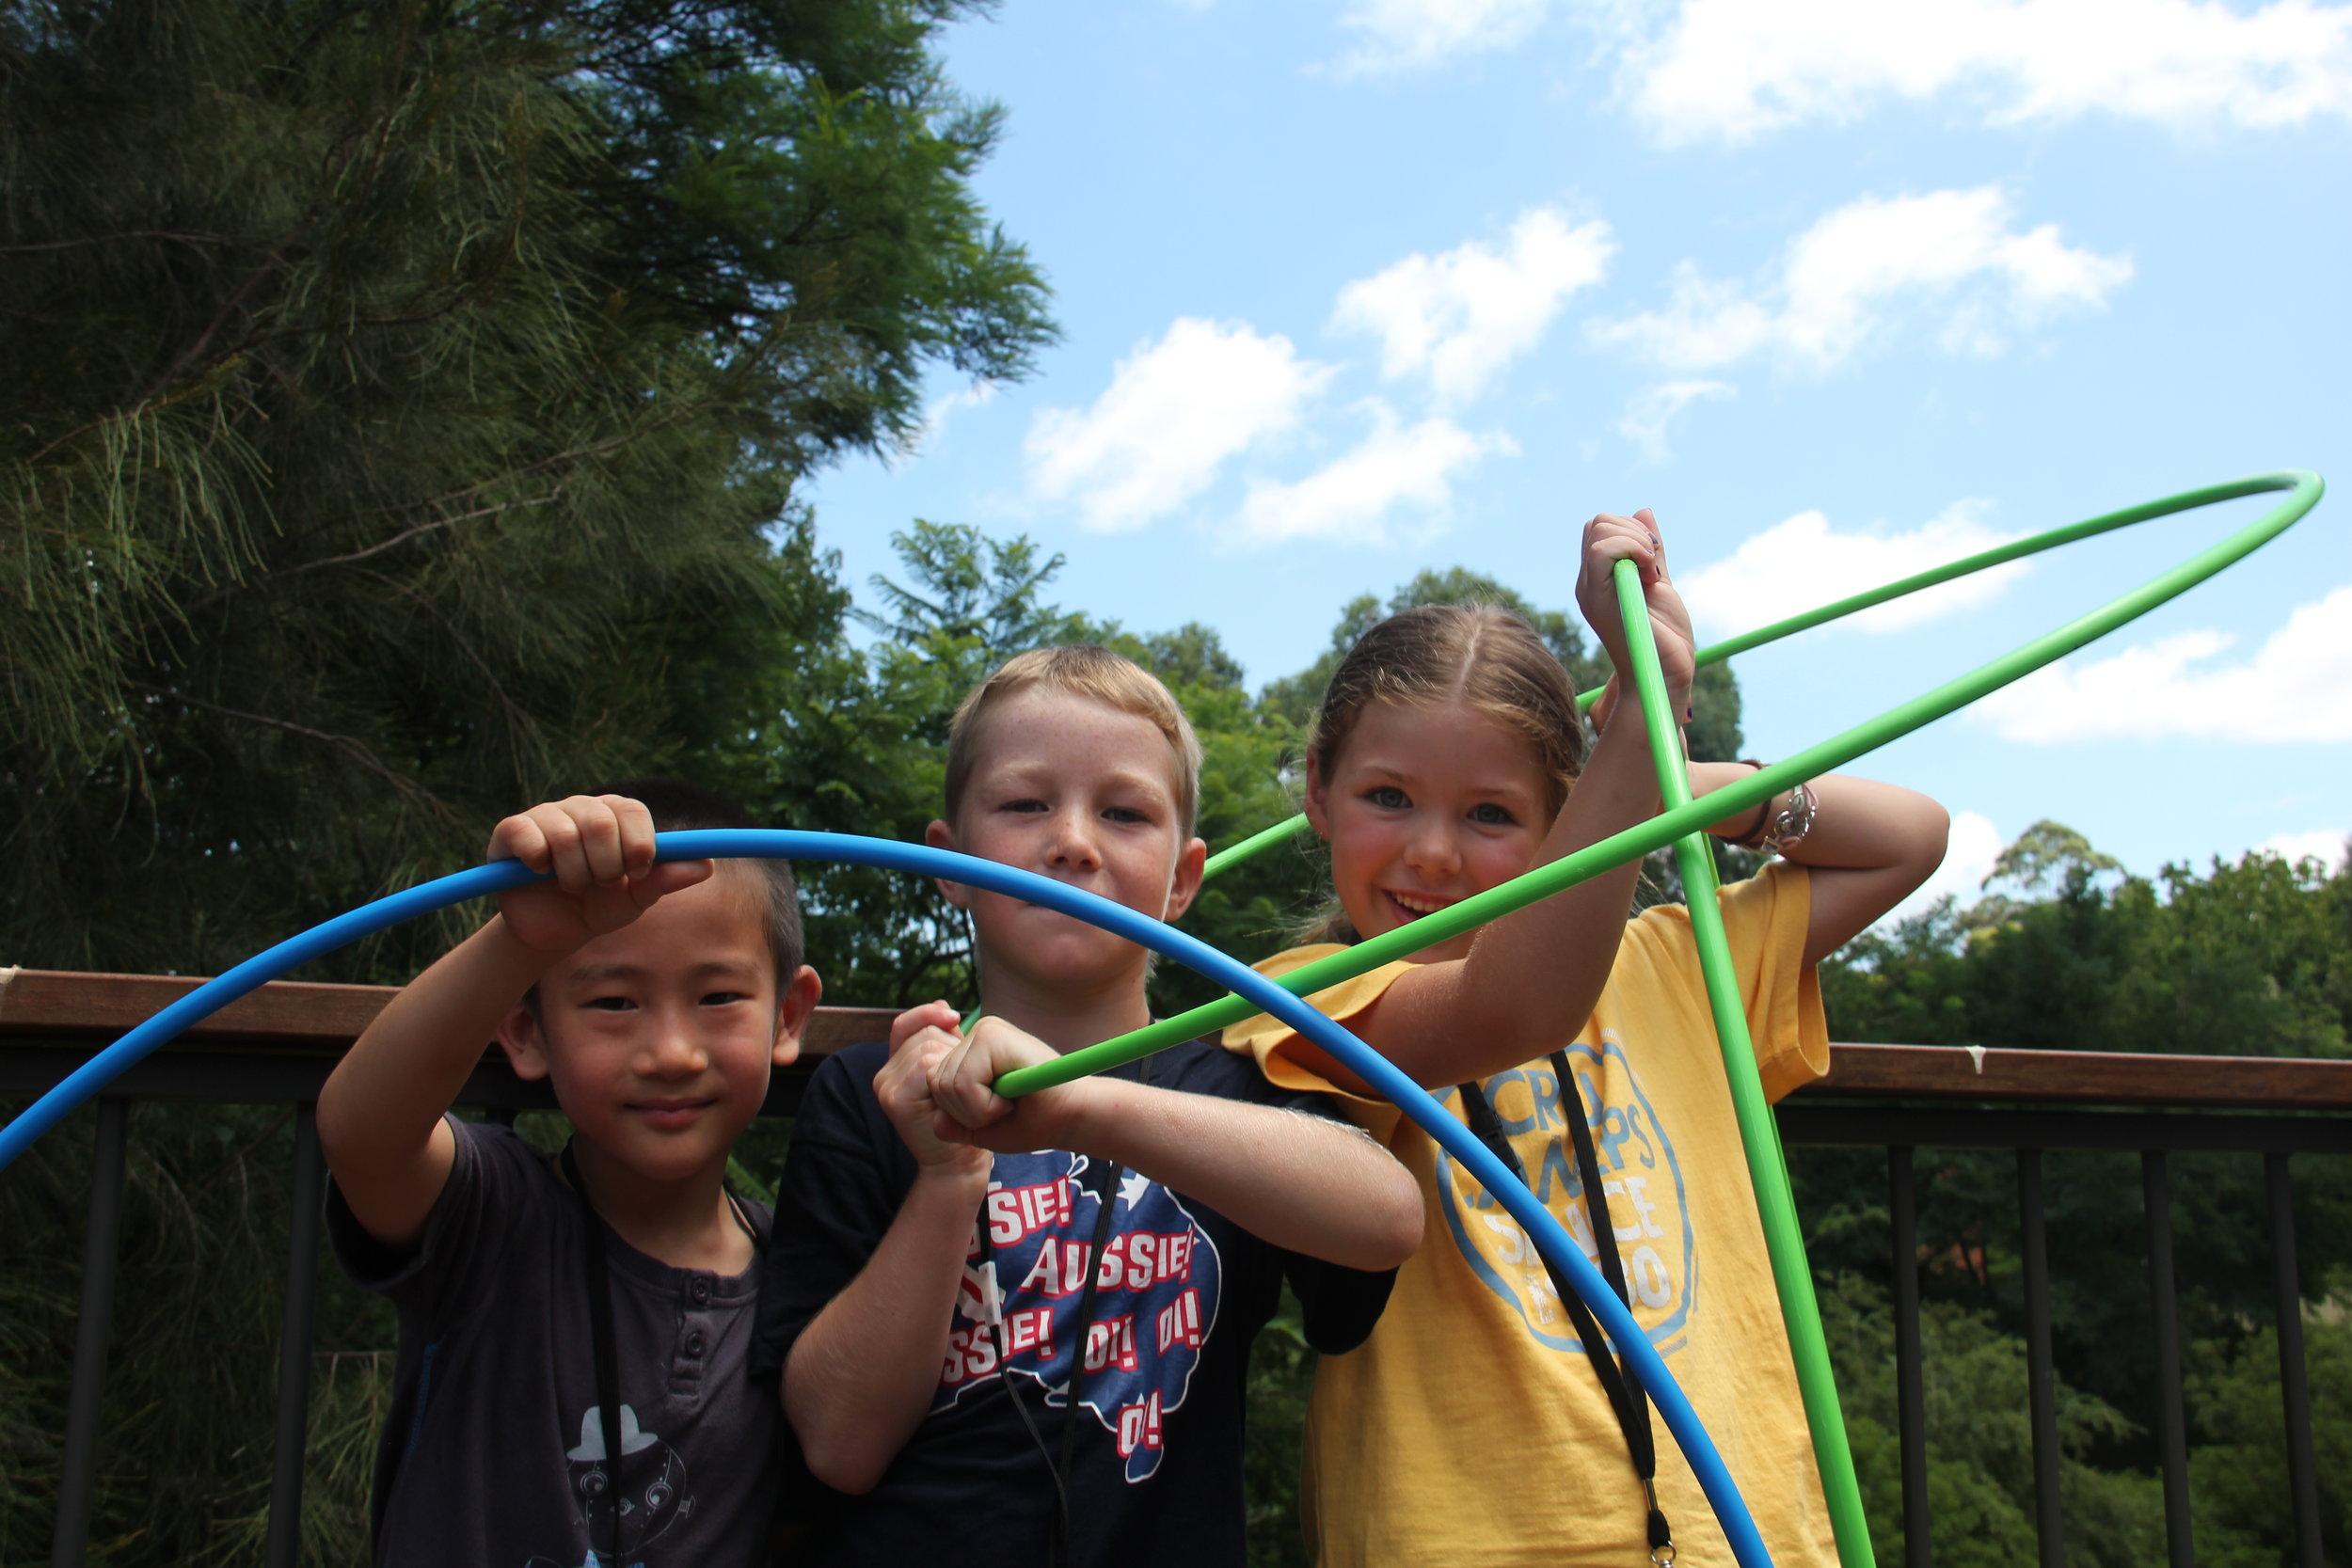 kids with hula hoops.JPG